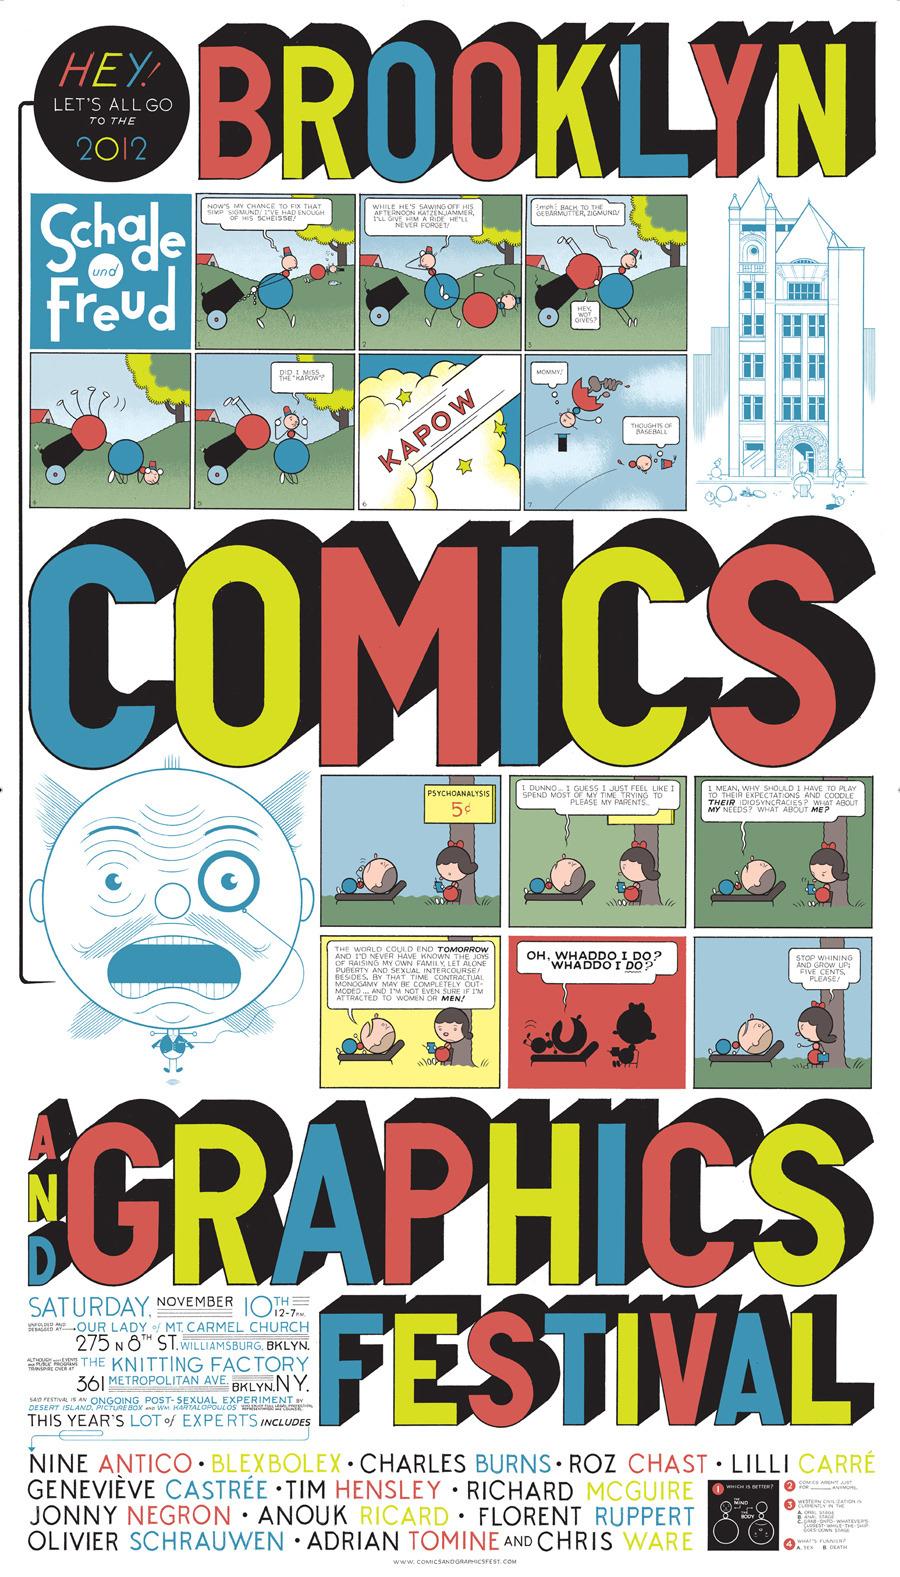 brooklyn comics and graphics festival 50 watts. Black Bedroom Furniture Sets. Home Design Ideas